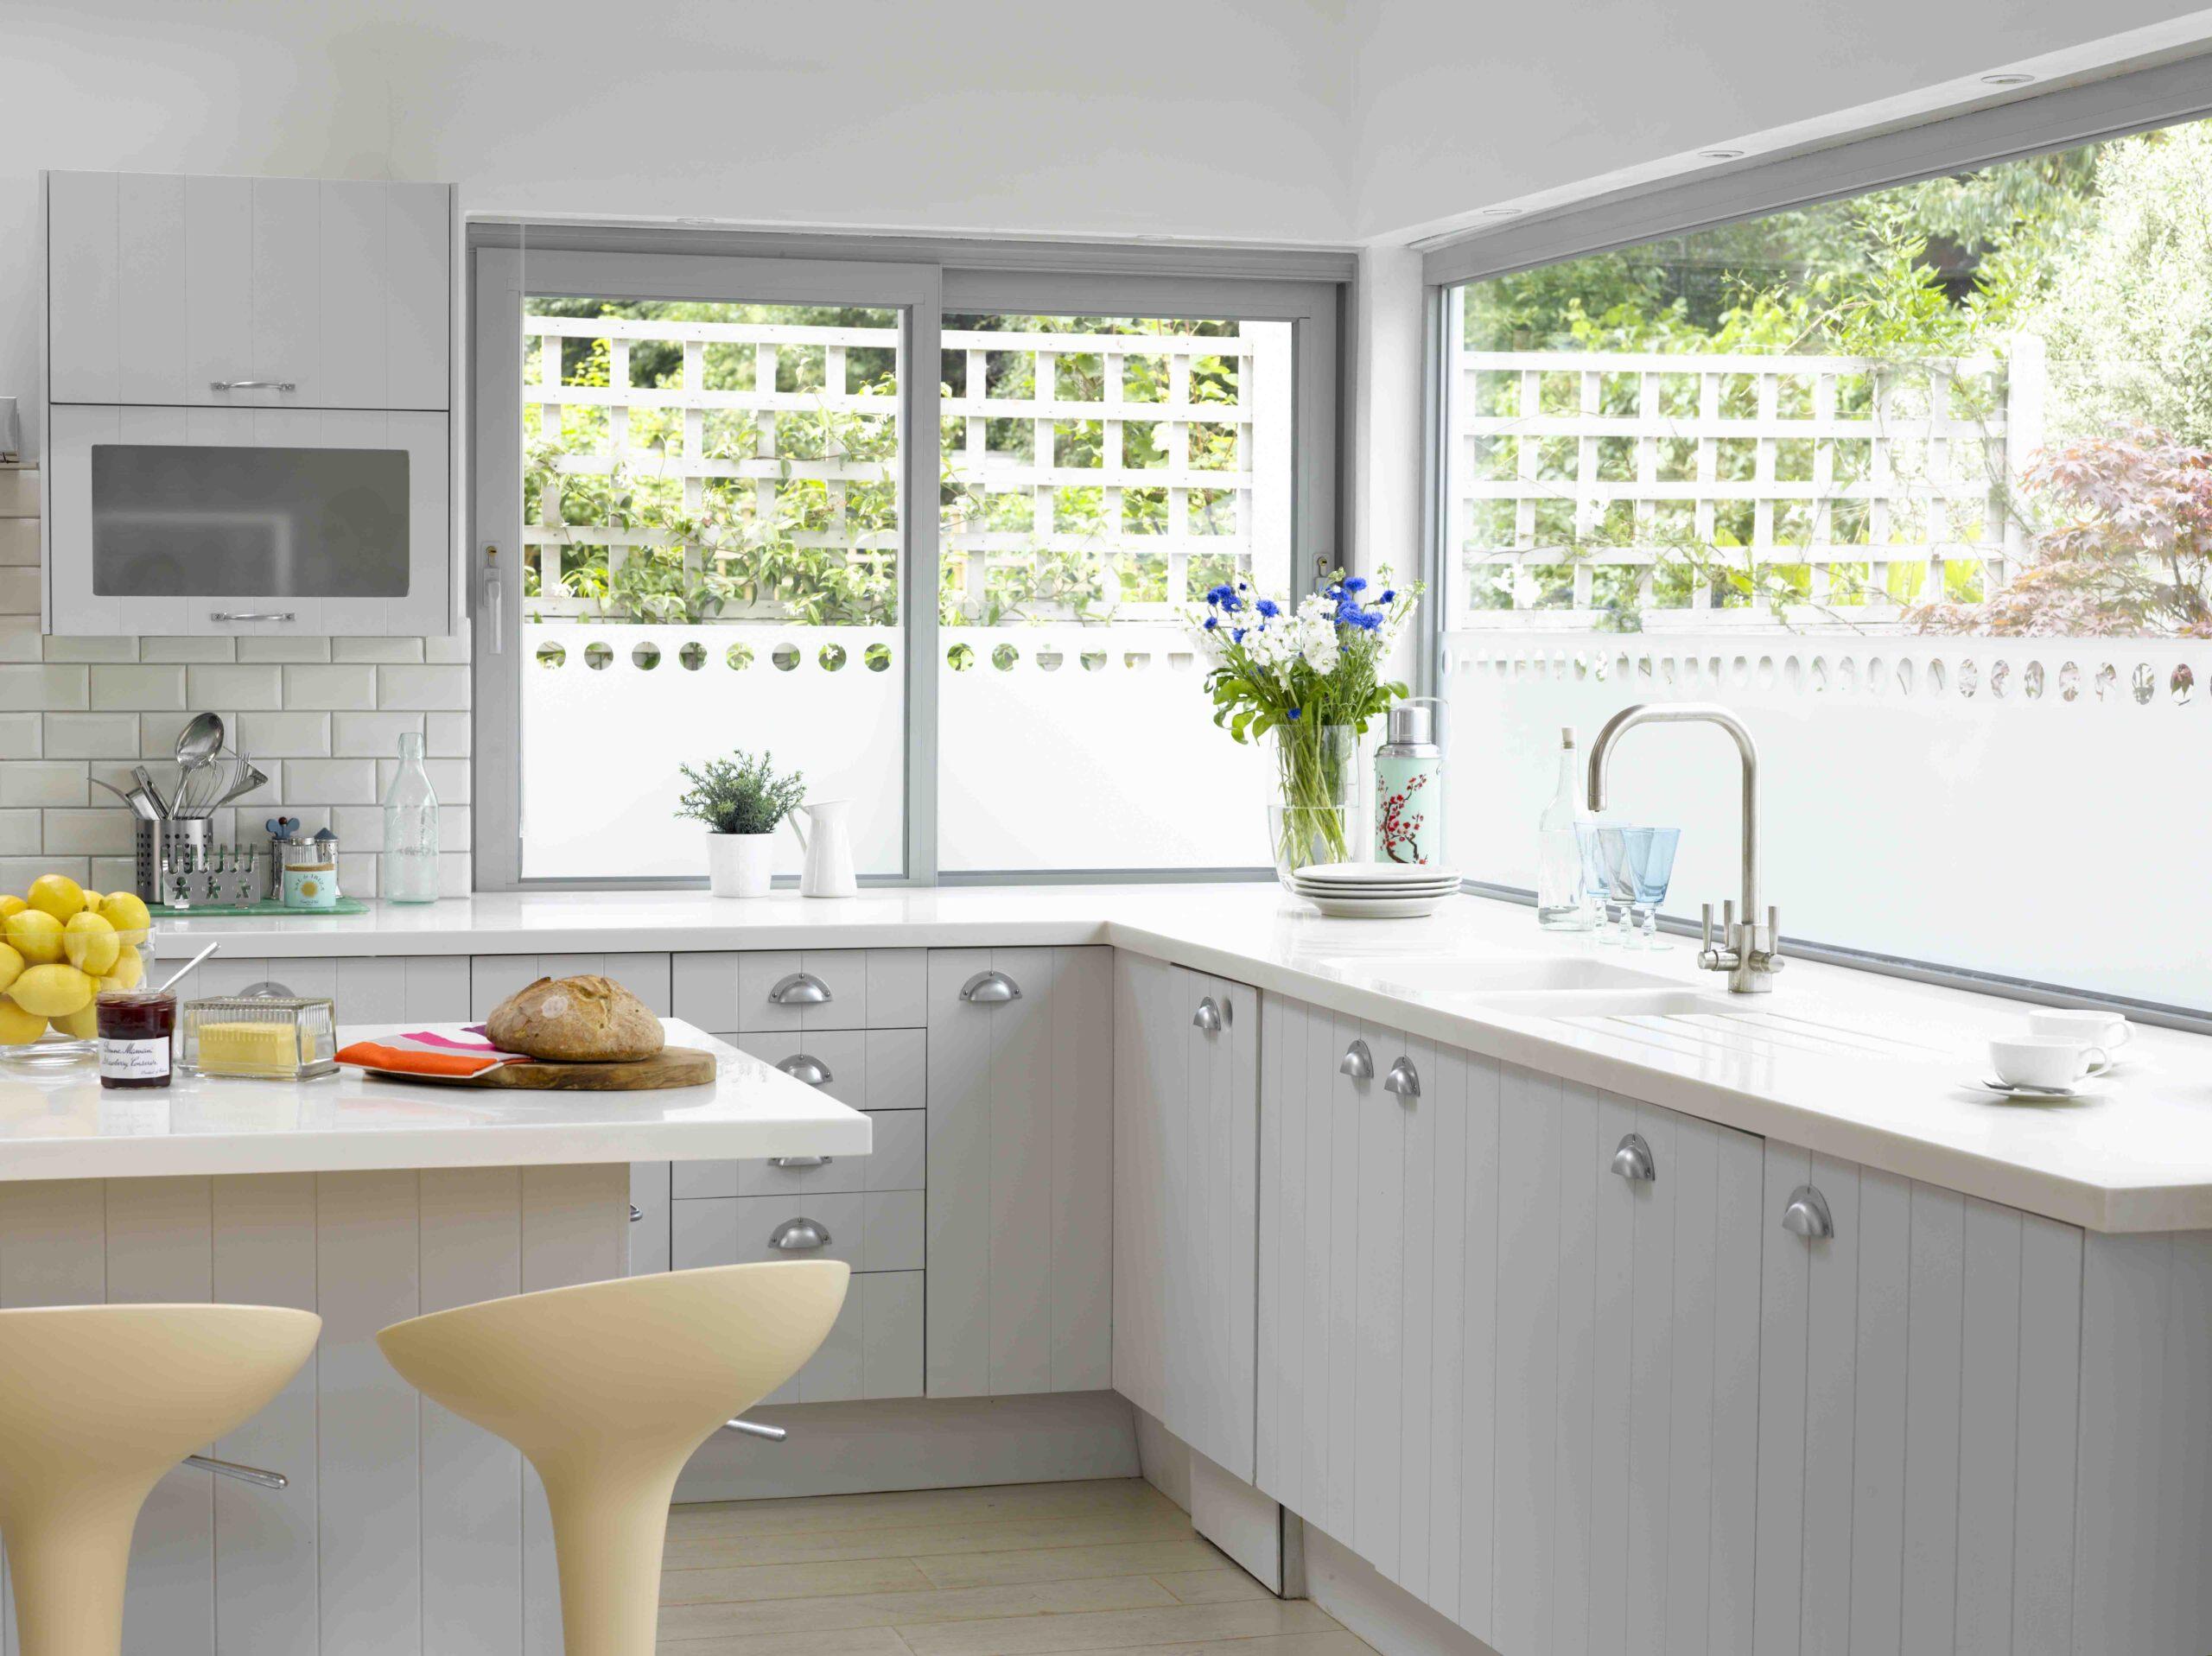 modne okna narożne w kuchni